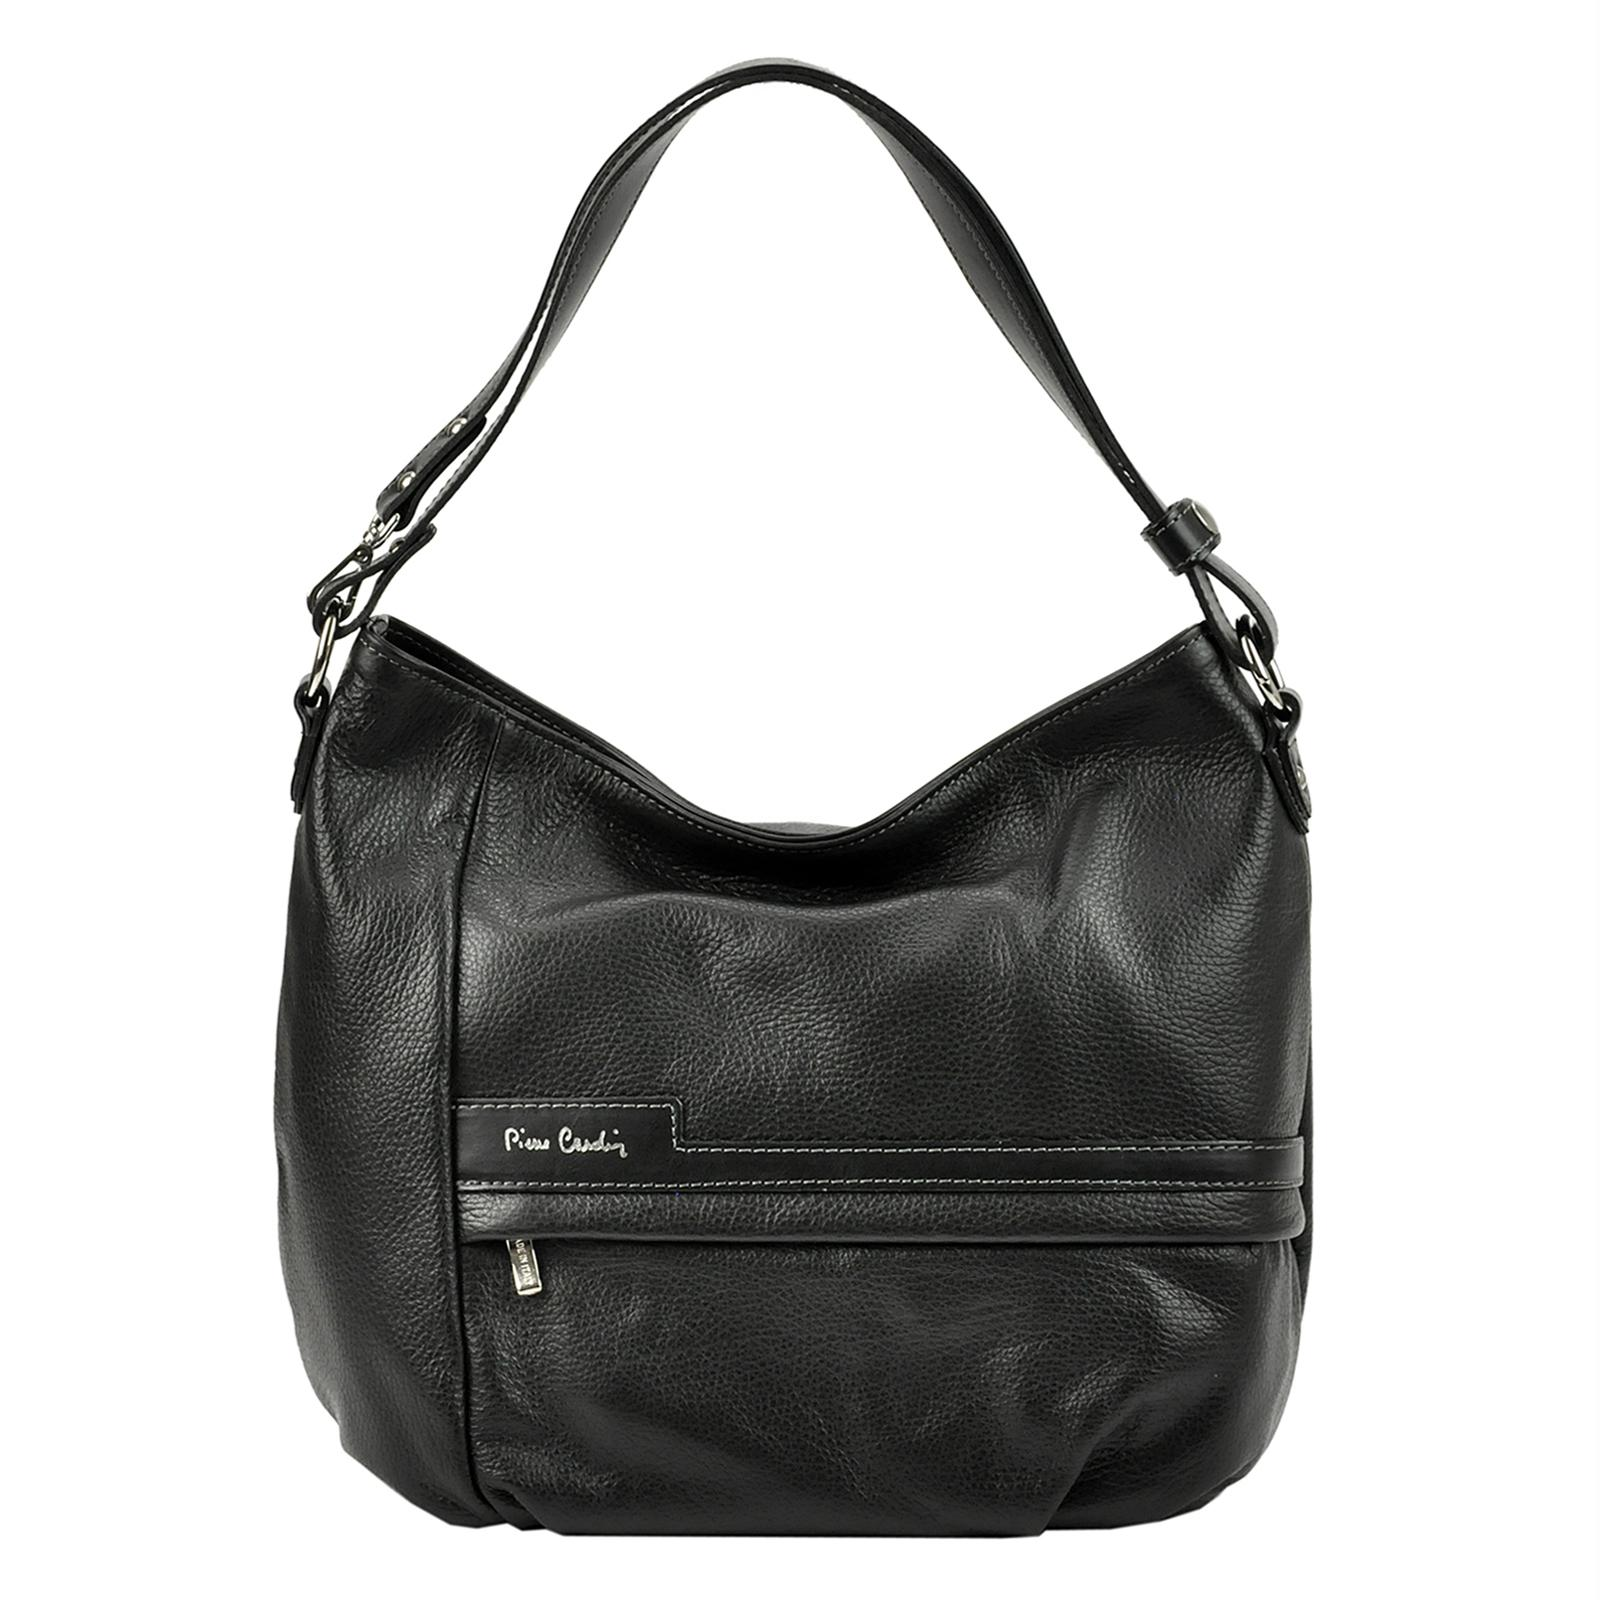 Praktická kožená kabelka Pierre Cardin.